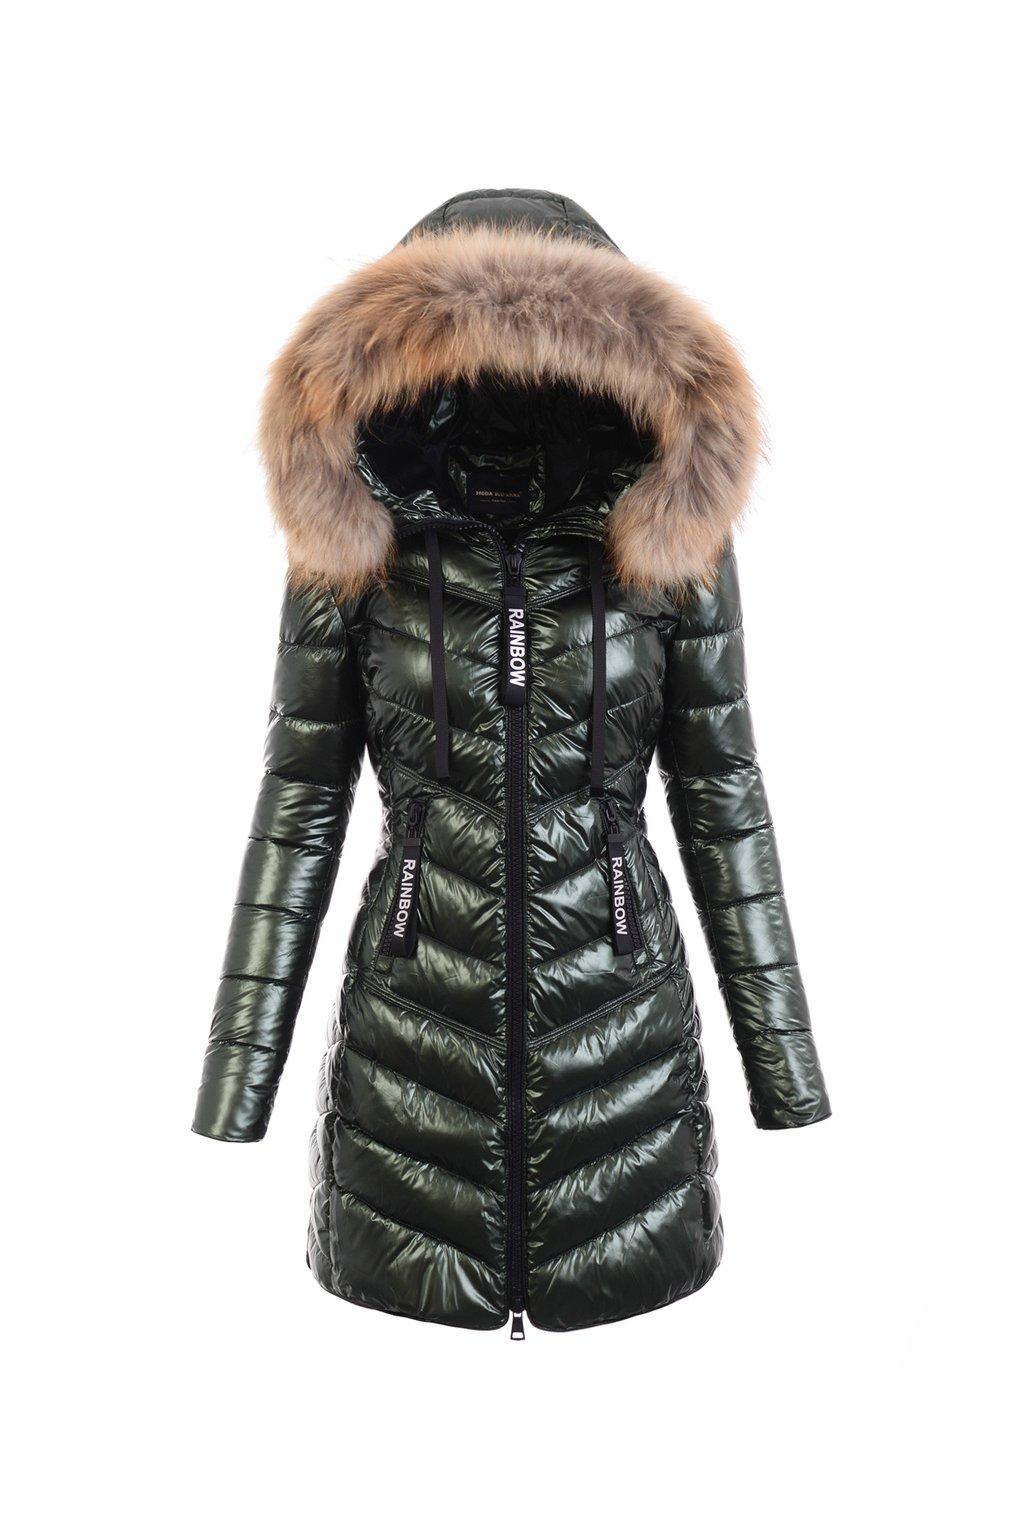 Dámska dlhá zimná bunda s pravou kožušinou  6114 zelená